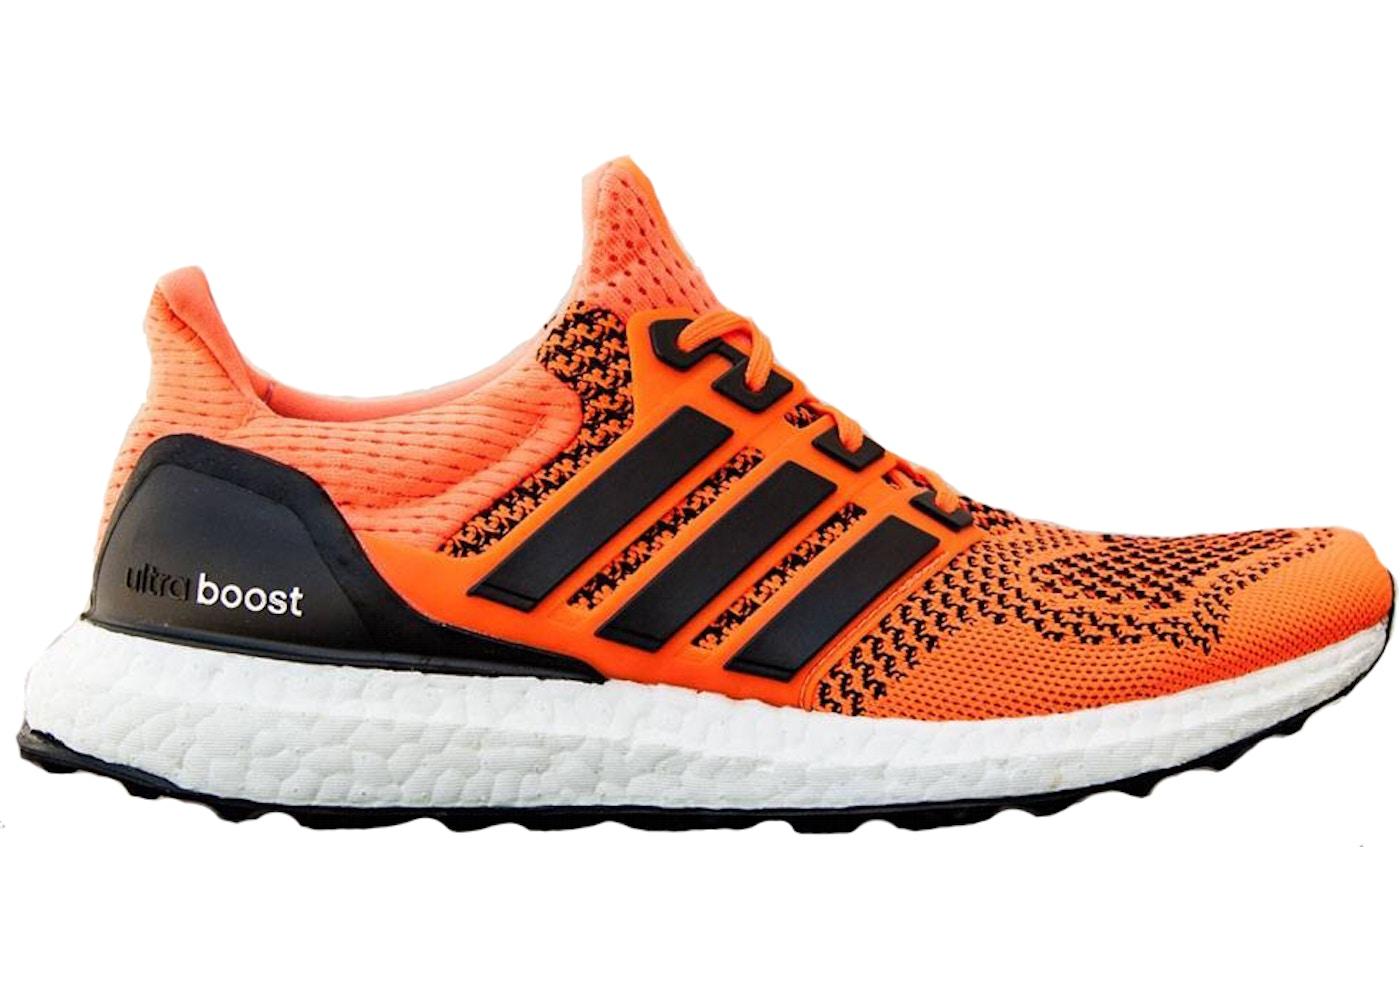 6b47b2ab4 adidas Ultra Boost 1.0 Shoes - Average Sale Price